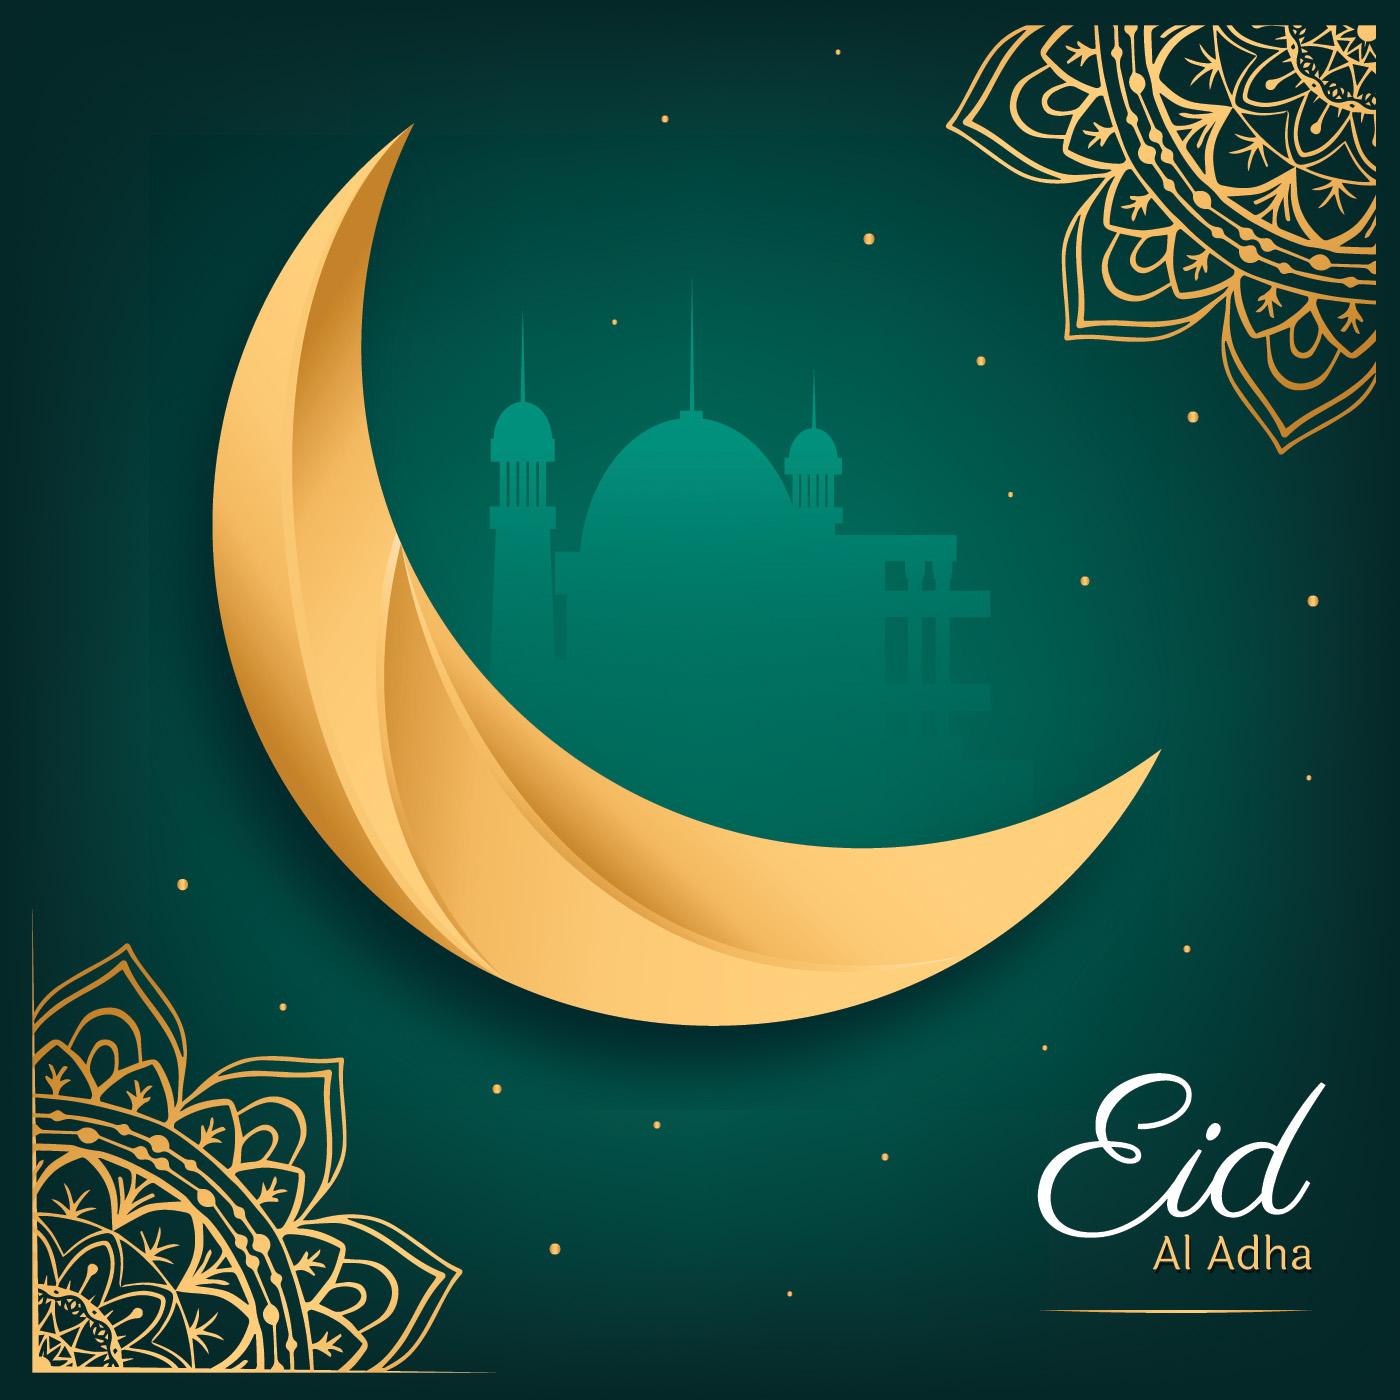 eid al adha greeting card vector design 662939  download